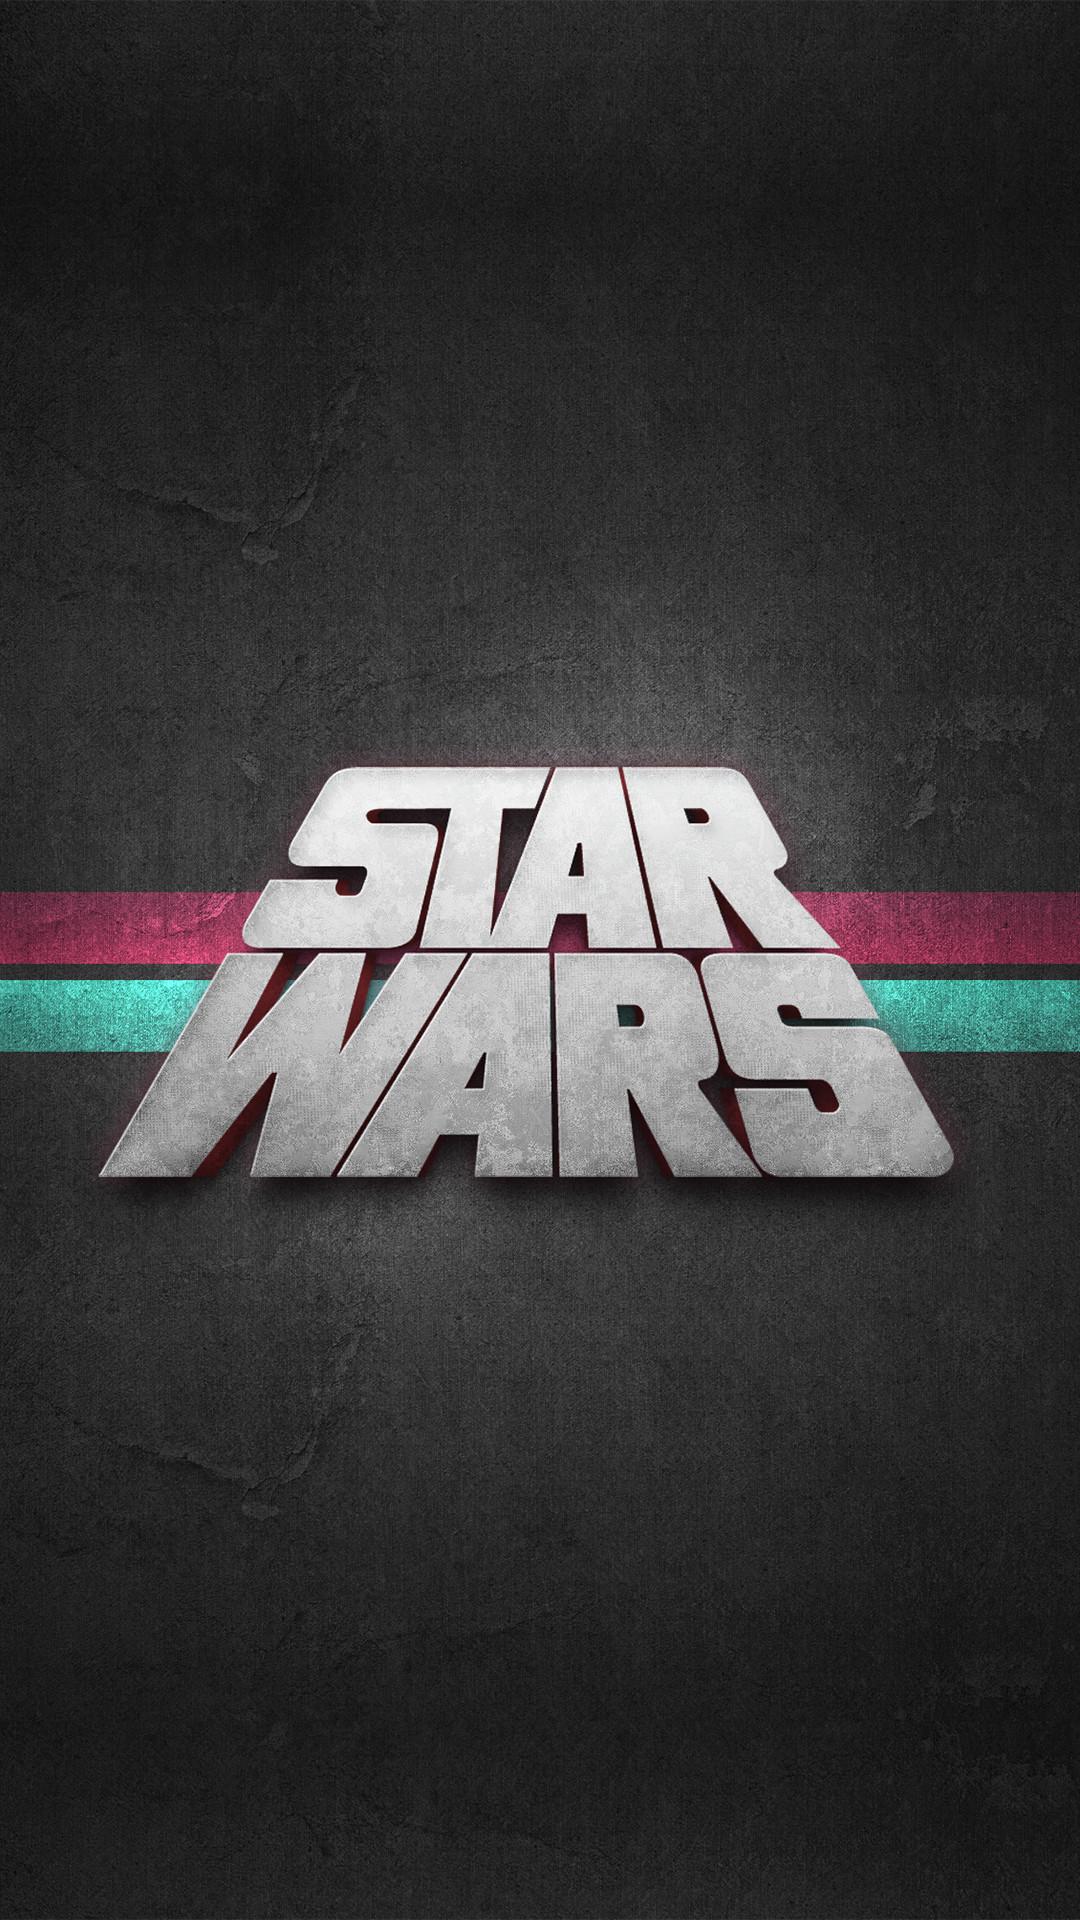 Star Wars Poster Dark Grunge Android Wallpaper